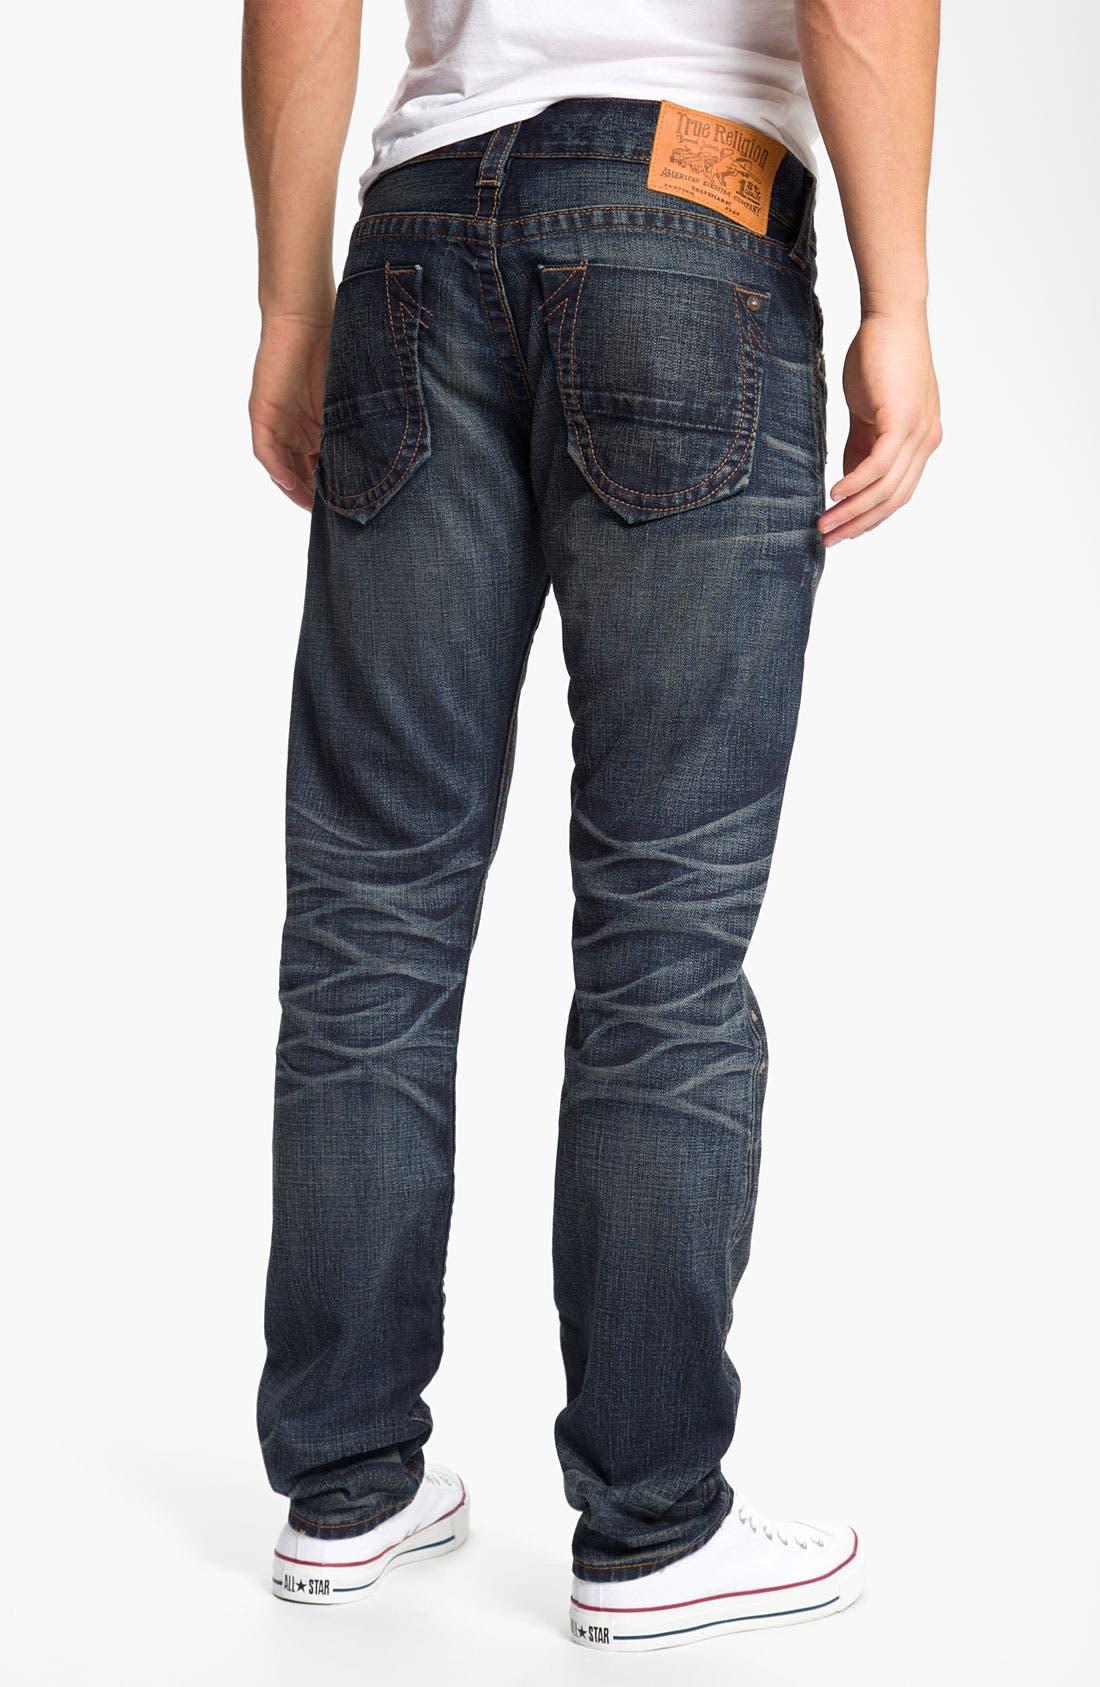 Main Image - True Religion Brand Jeans 'Geno' Slim Straight Leg Jeans (Snyper)